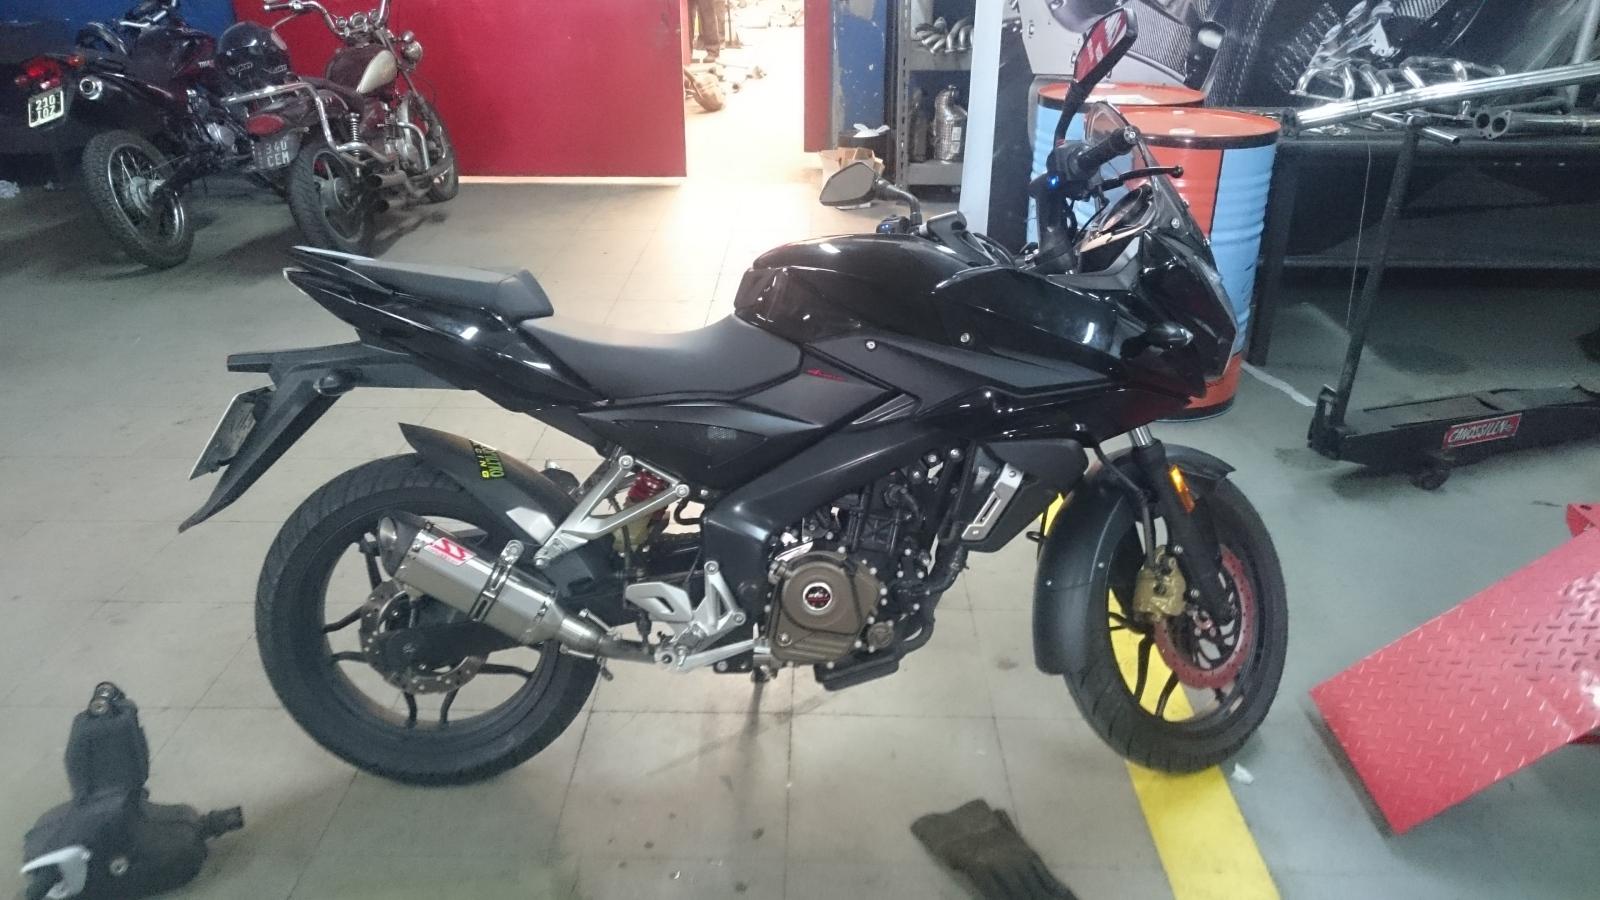 Escape deportivo Cañossilen que ofrece líder motos 35c0arm